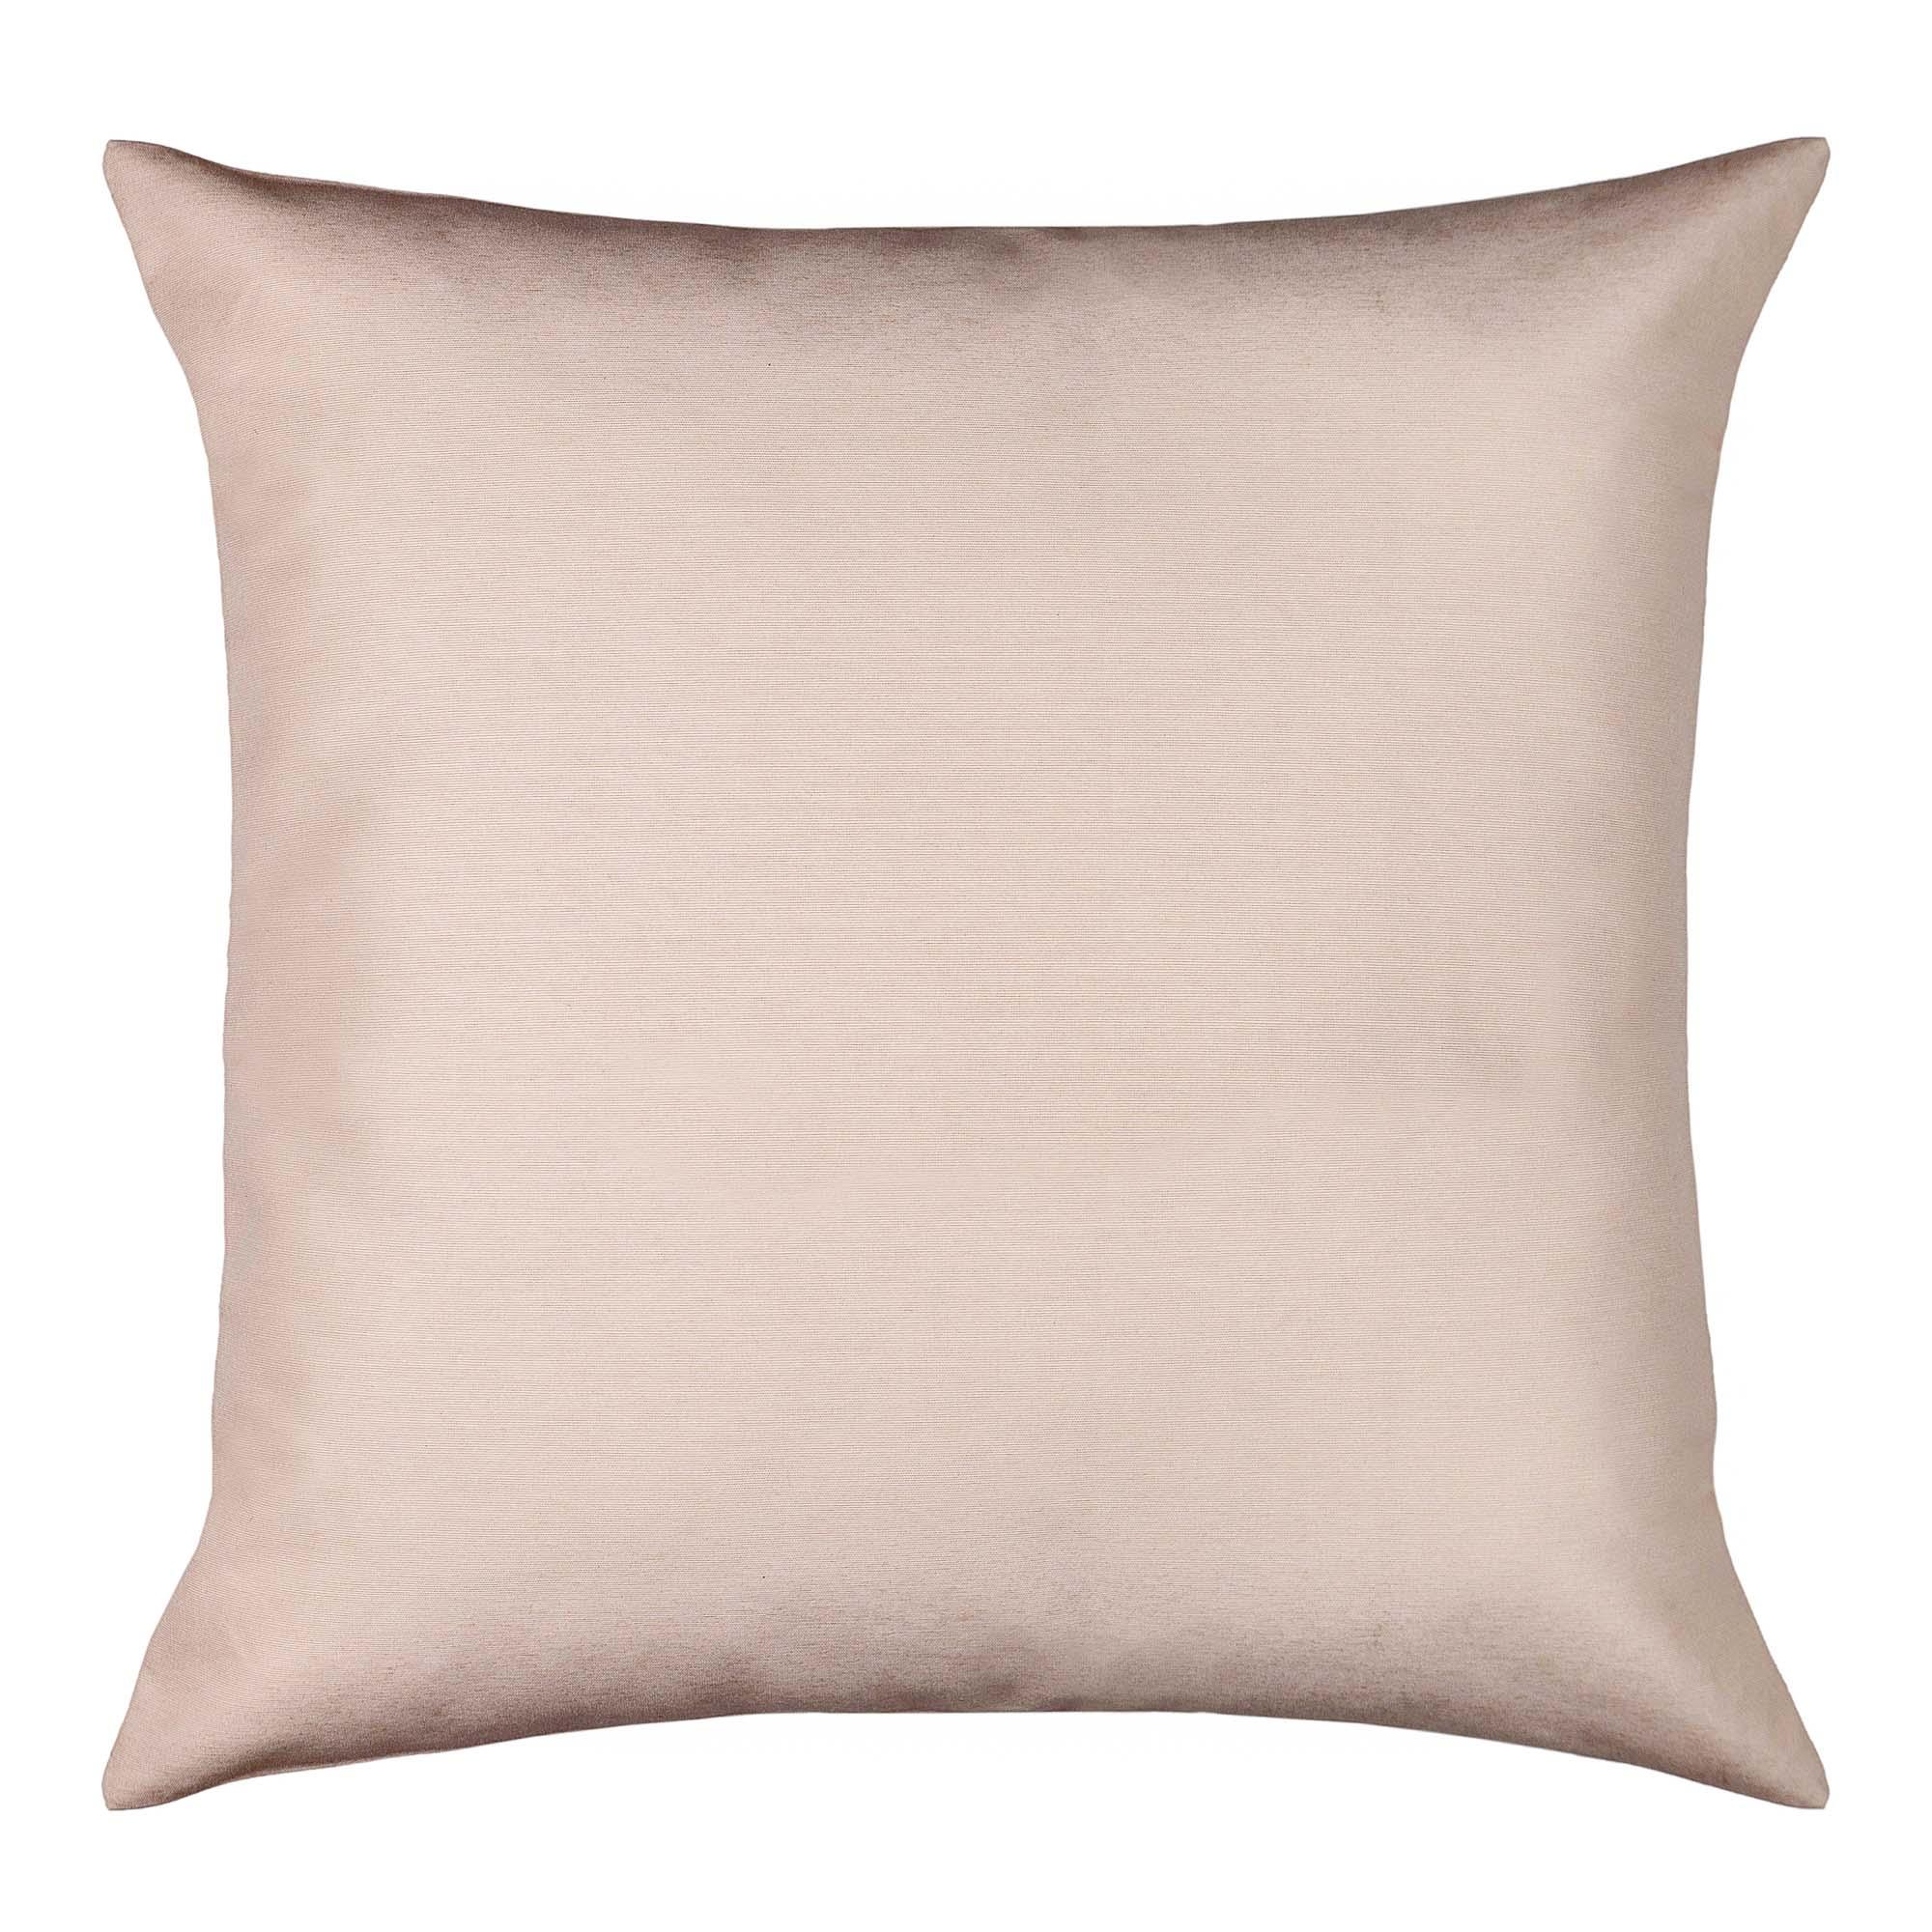 Capa para almofada santista madri 45 x 45 cm 81% algodao 19% poliester nude